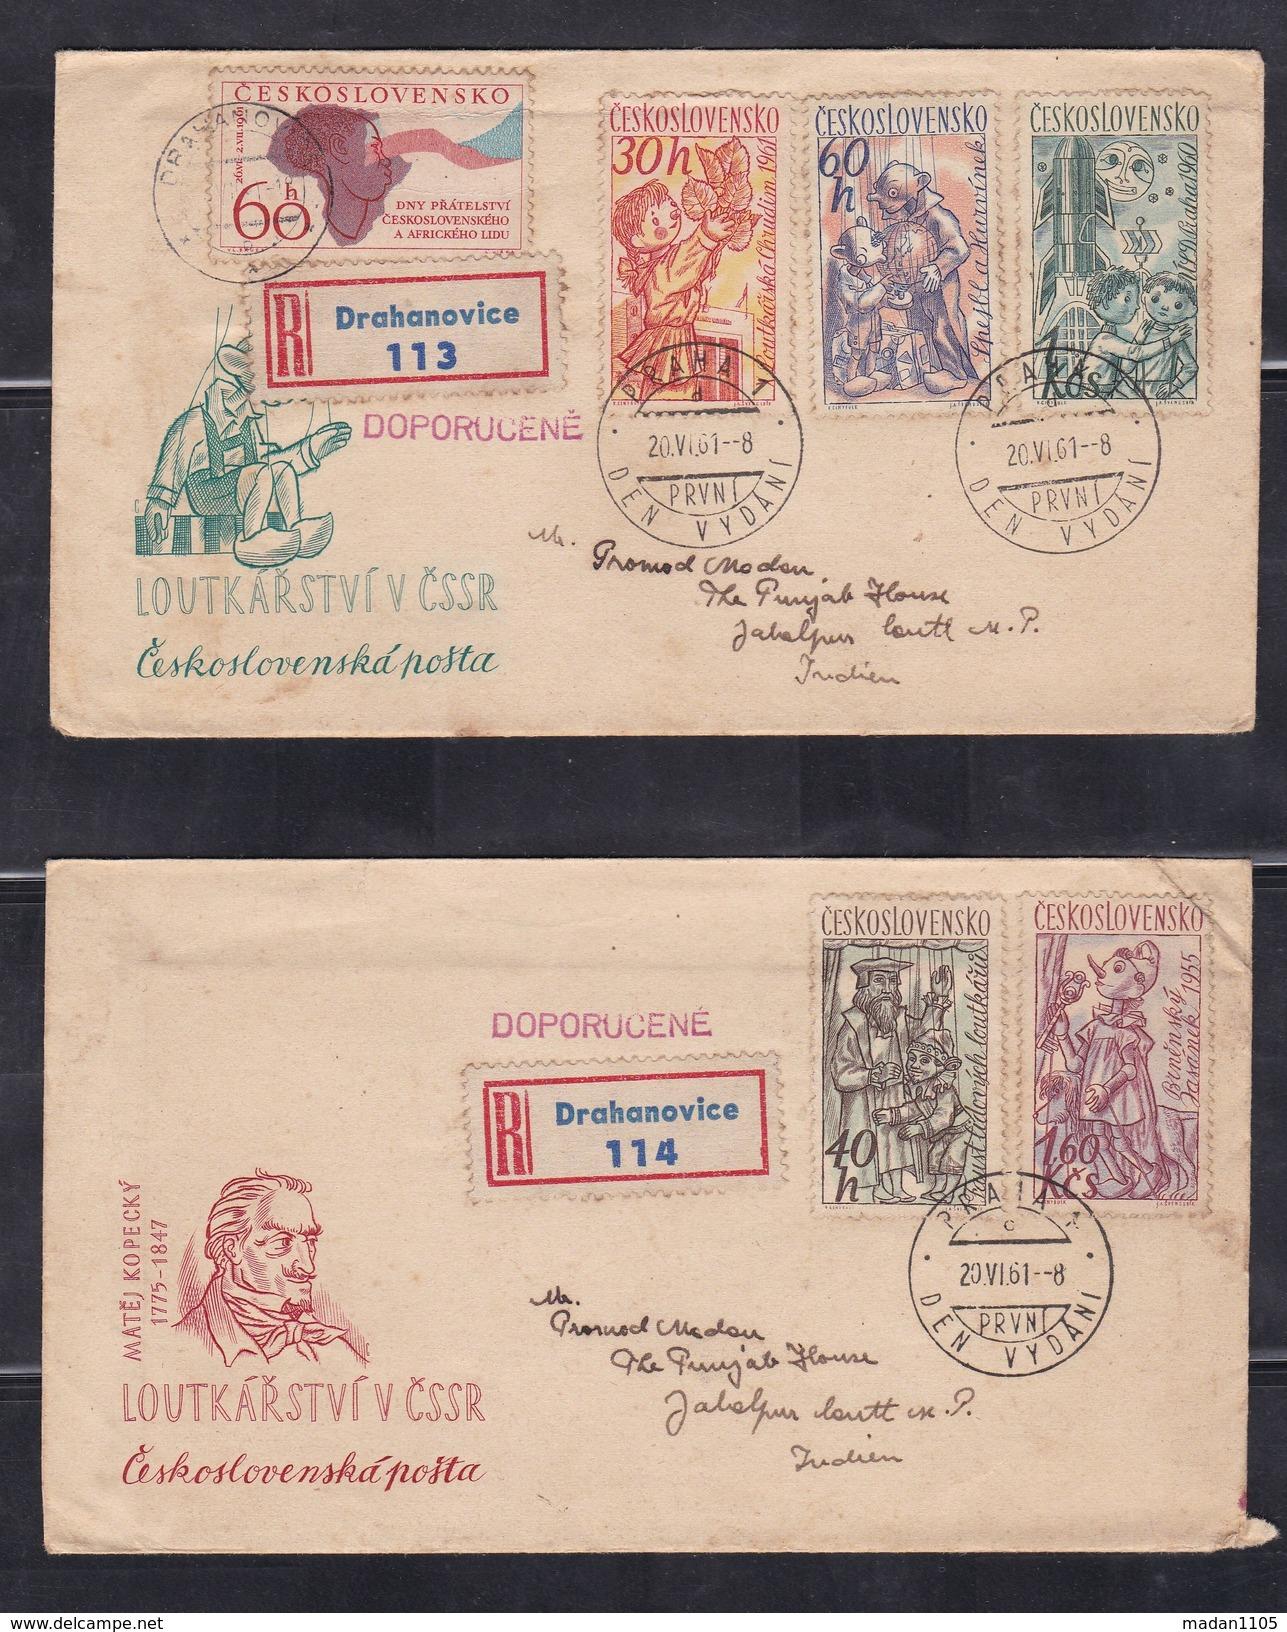 CZECHOSLOVAKIA, 1961, Set Of 2 FDC's, Czech Puppets, Set 5 V Complete+ 1 Additional Stamp On Reverse - Briefe U. Dokumente